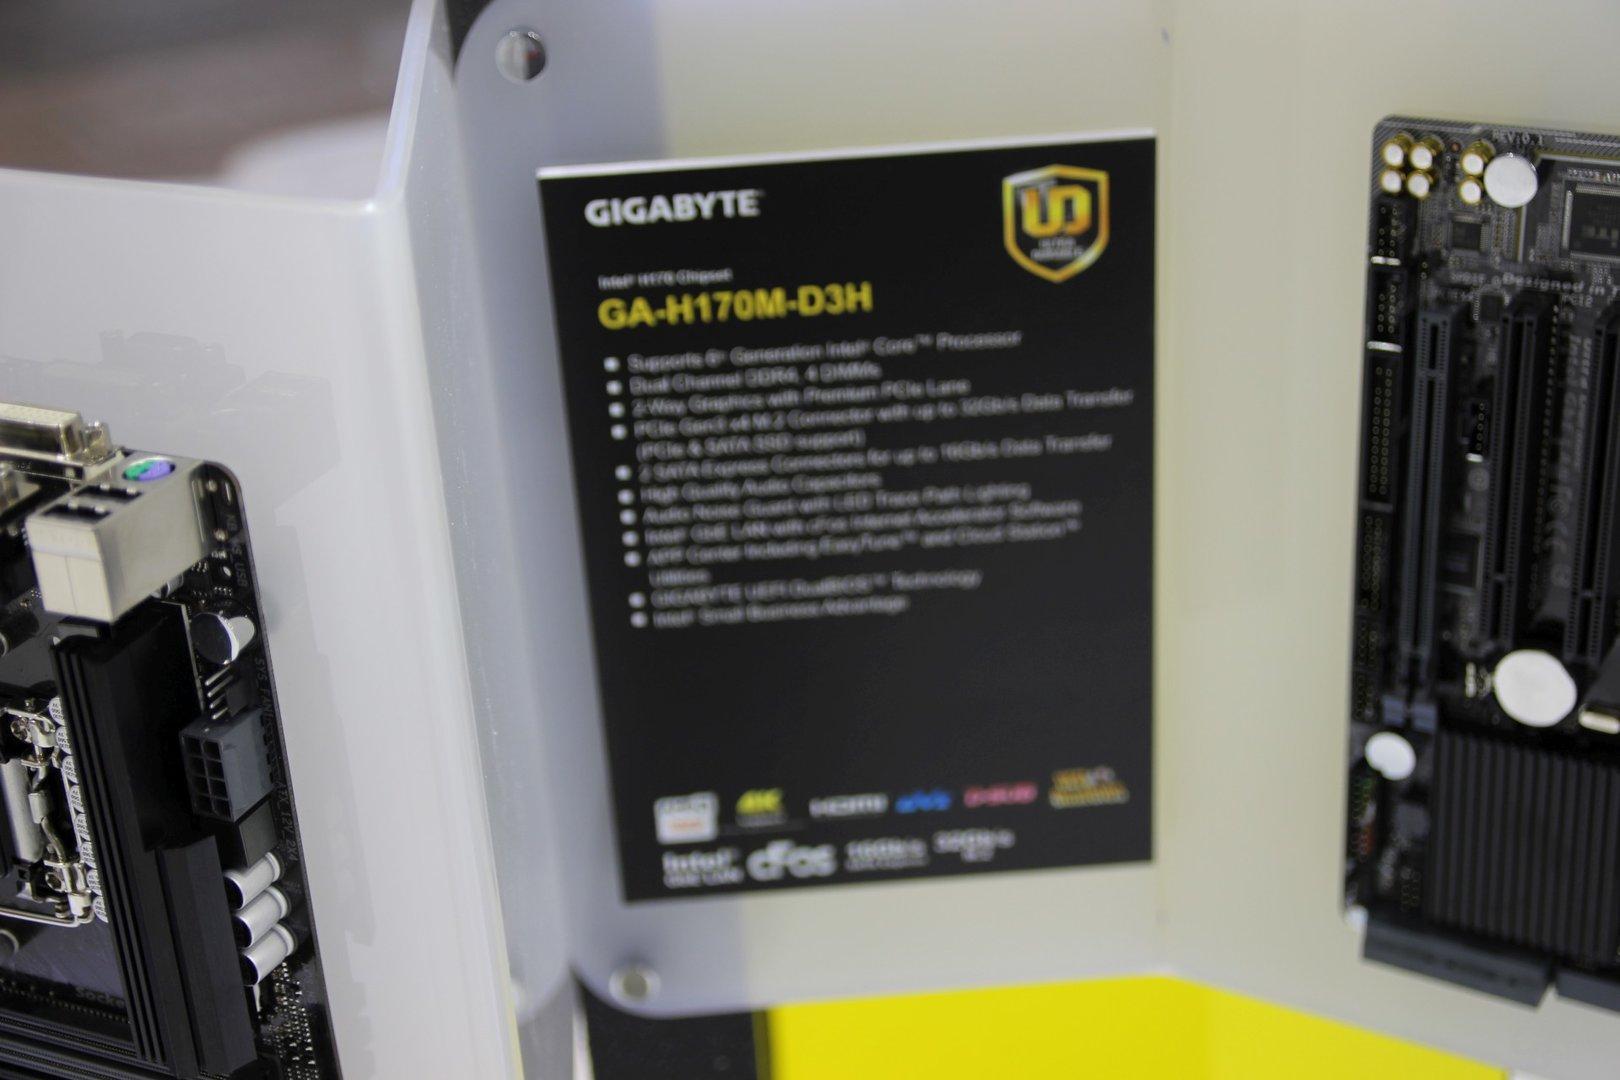 Spezifikationen des Gigabyte GA-H170M-D3H